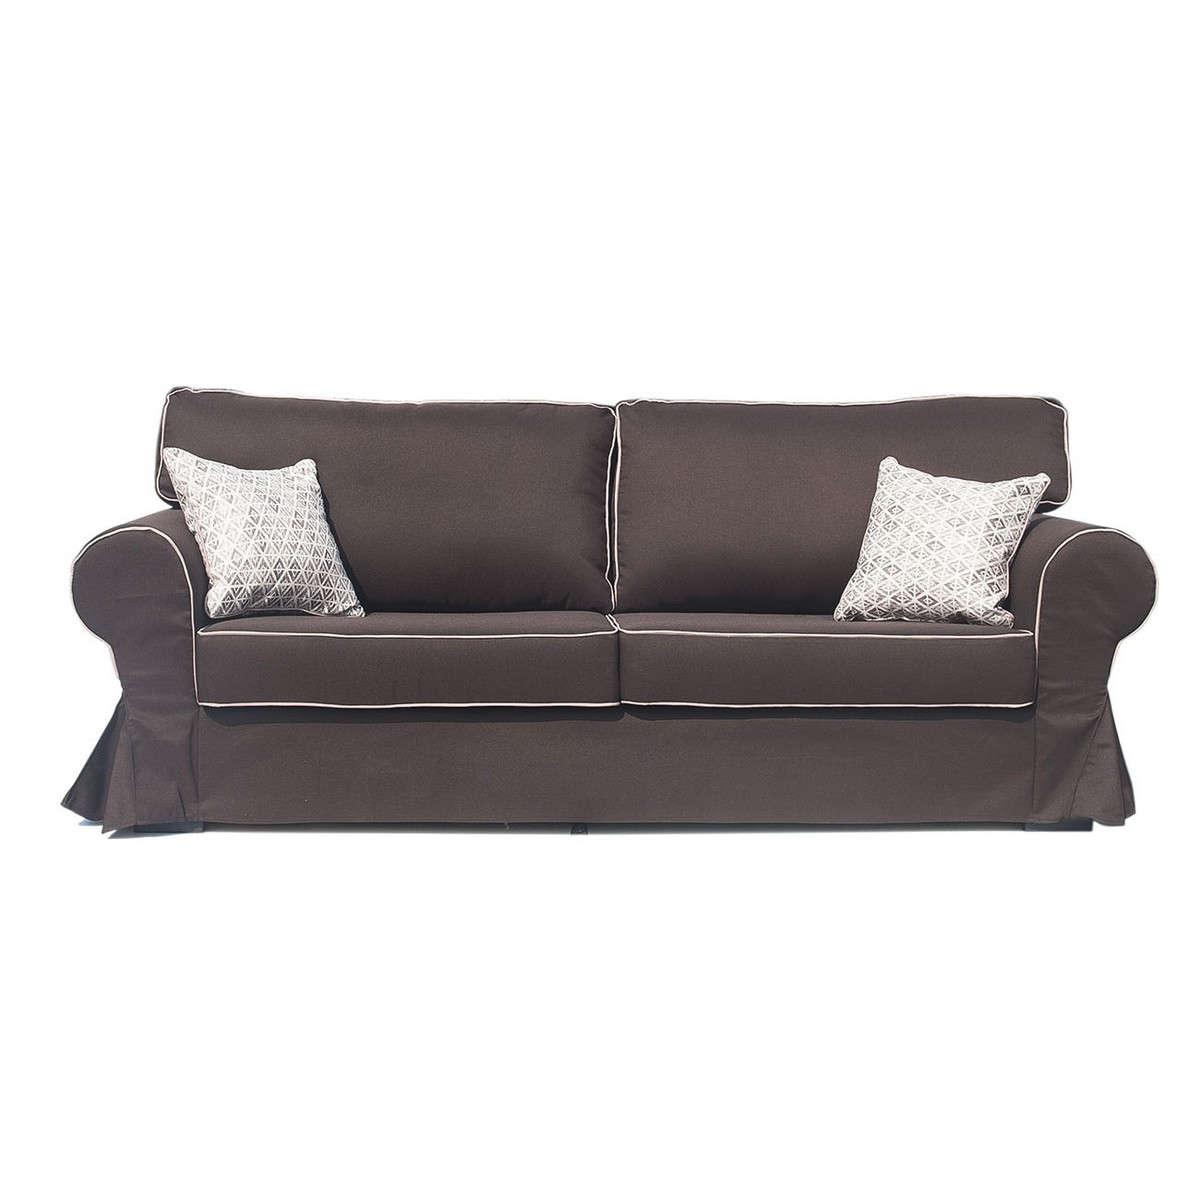 Aidonitsa Καναπές-Κρεβάτι Υφασμάτινος VICTORIA Καφέ KO-VICTORIA3S-20 230x90x90εκ.